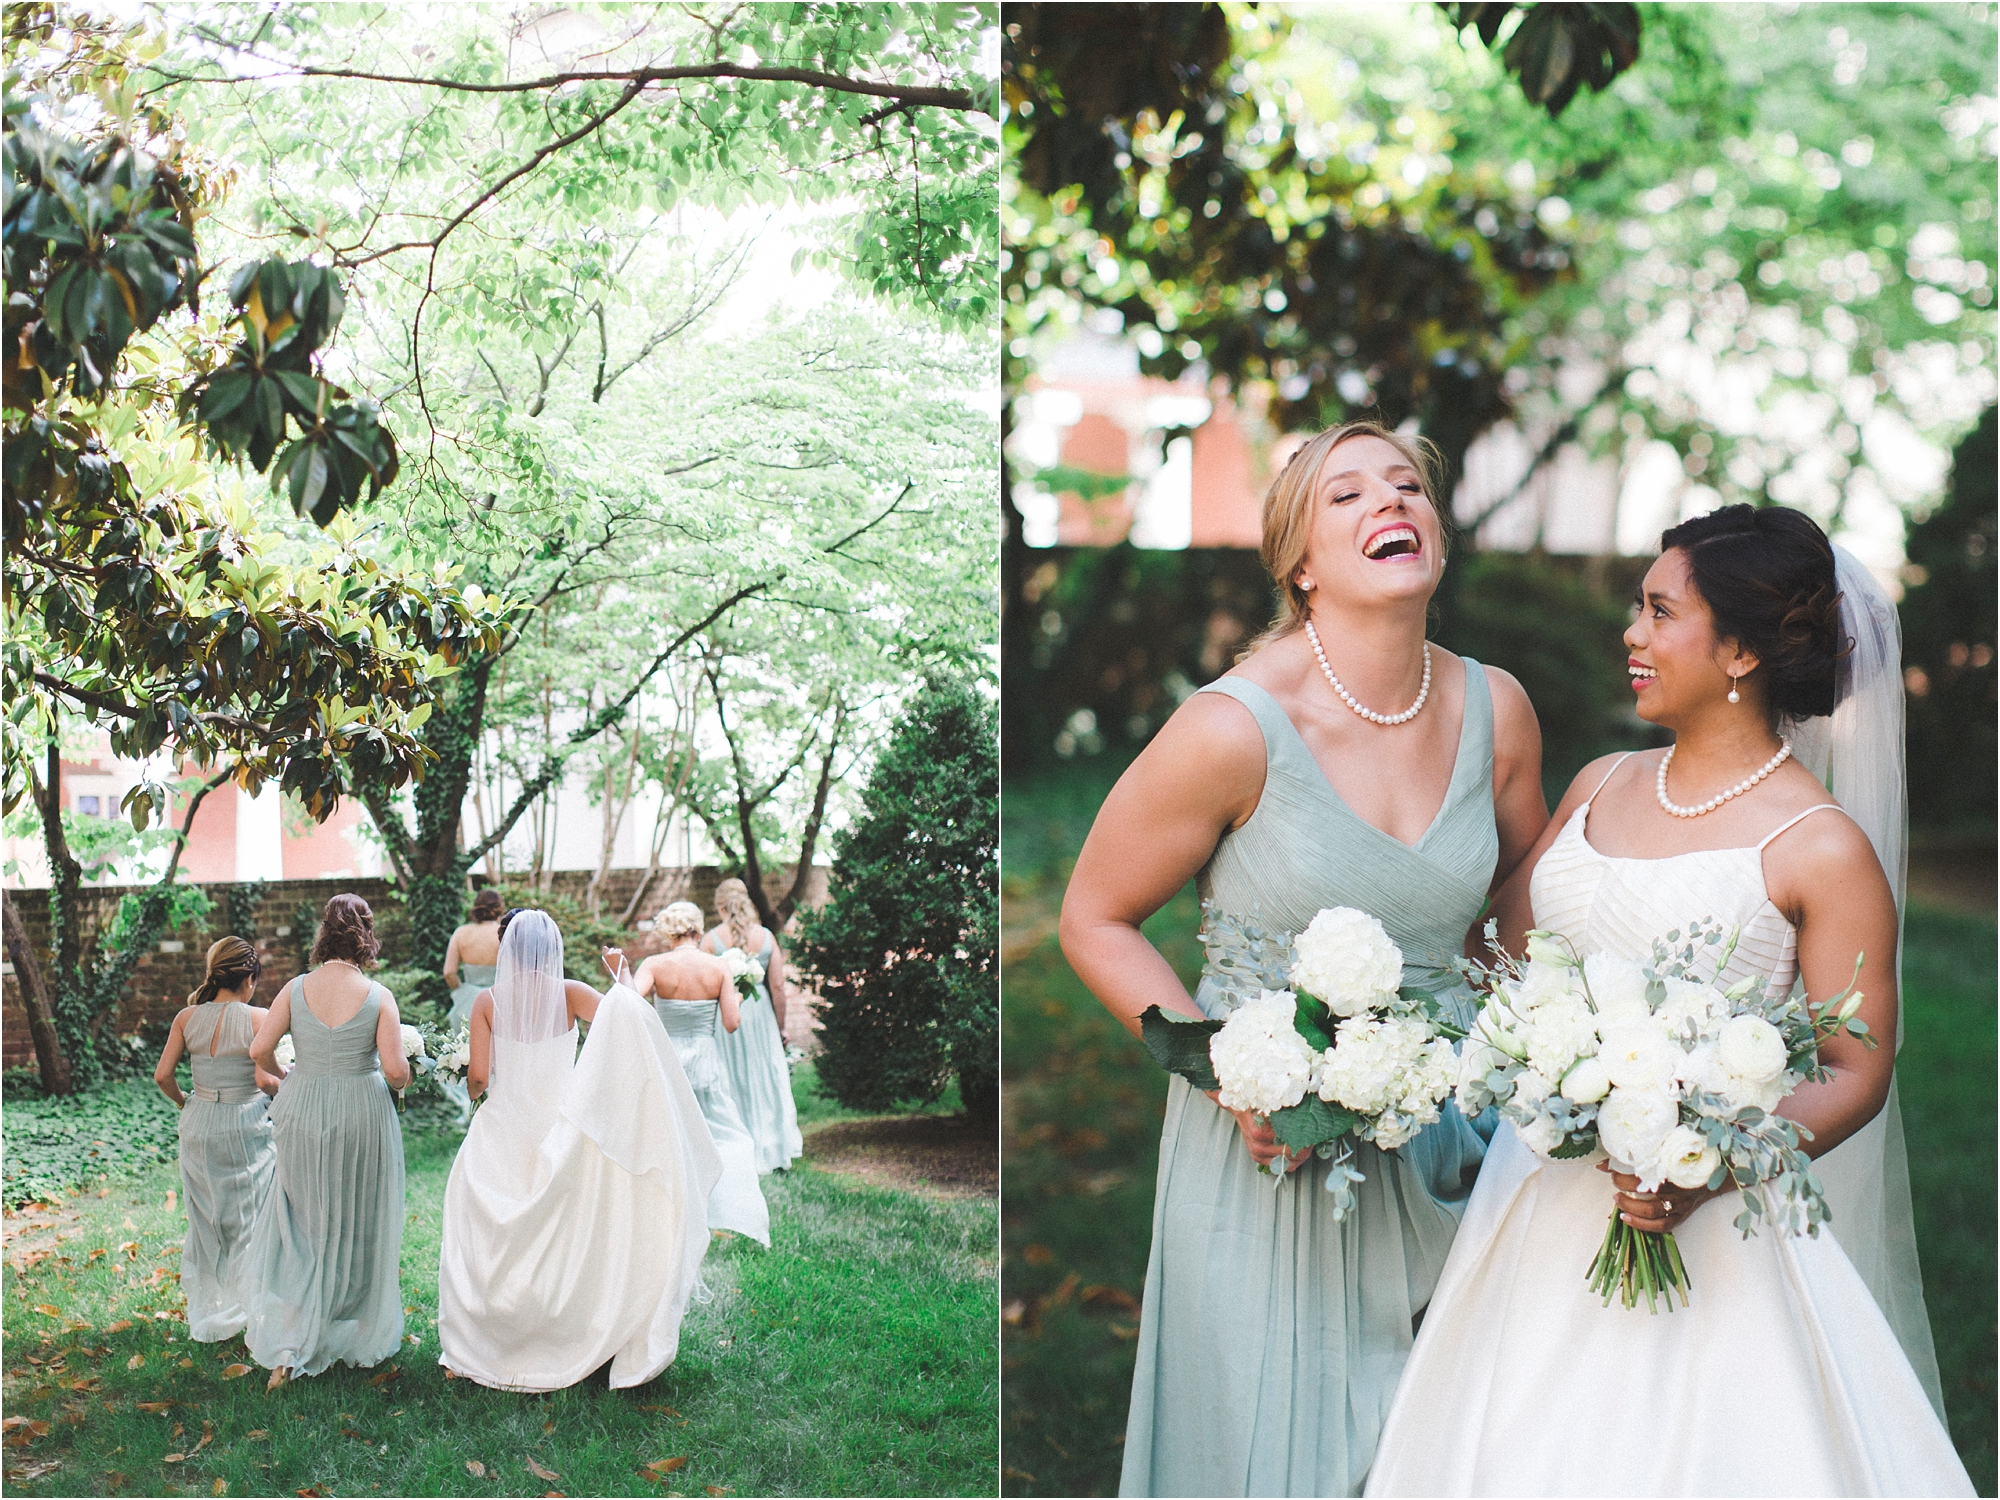 stephanie-yonce-photography-historic-church-virginia-museu-fine-arts-wedding-photos_035.JPG